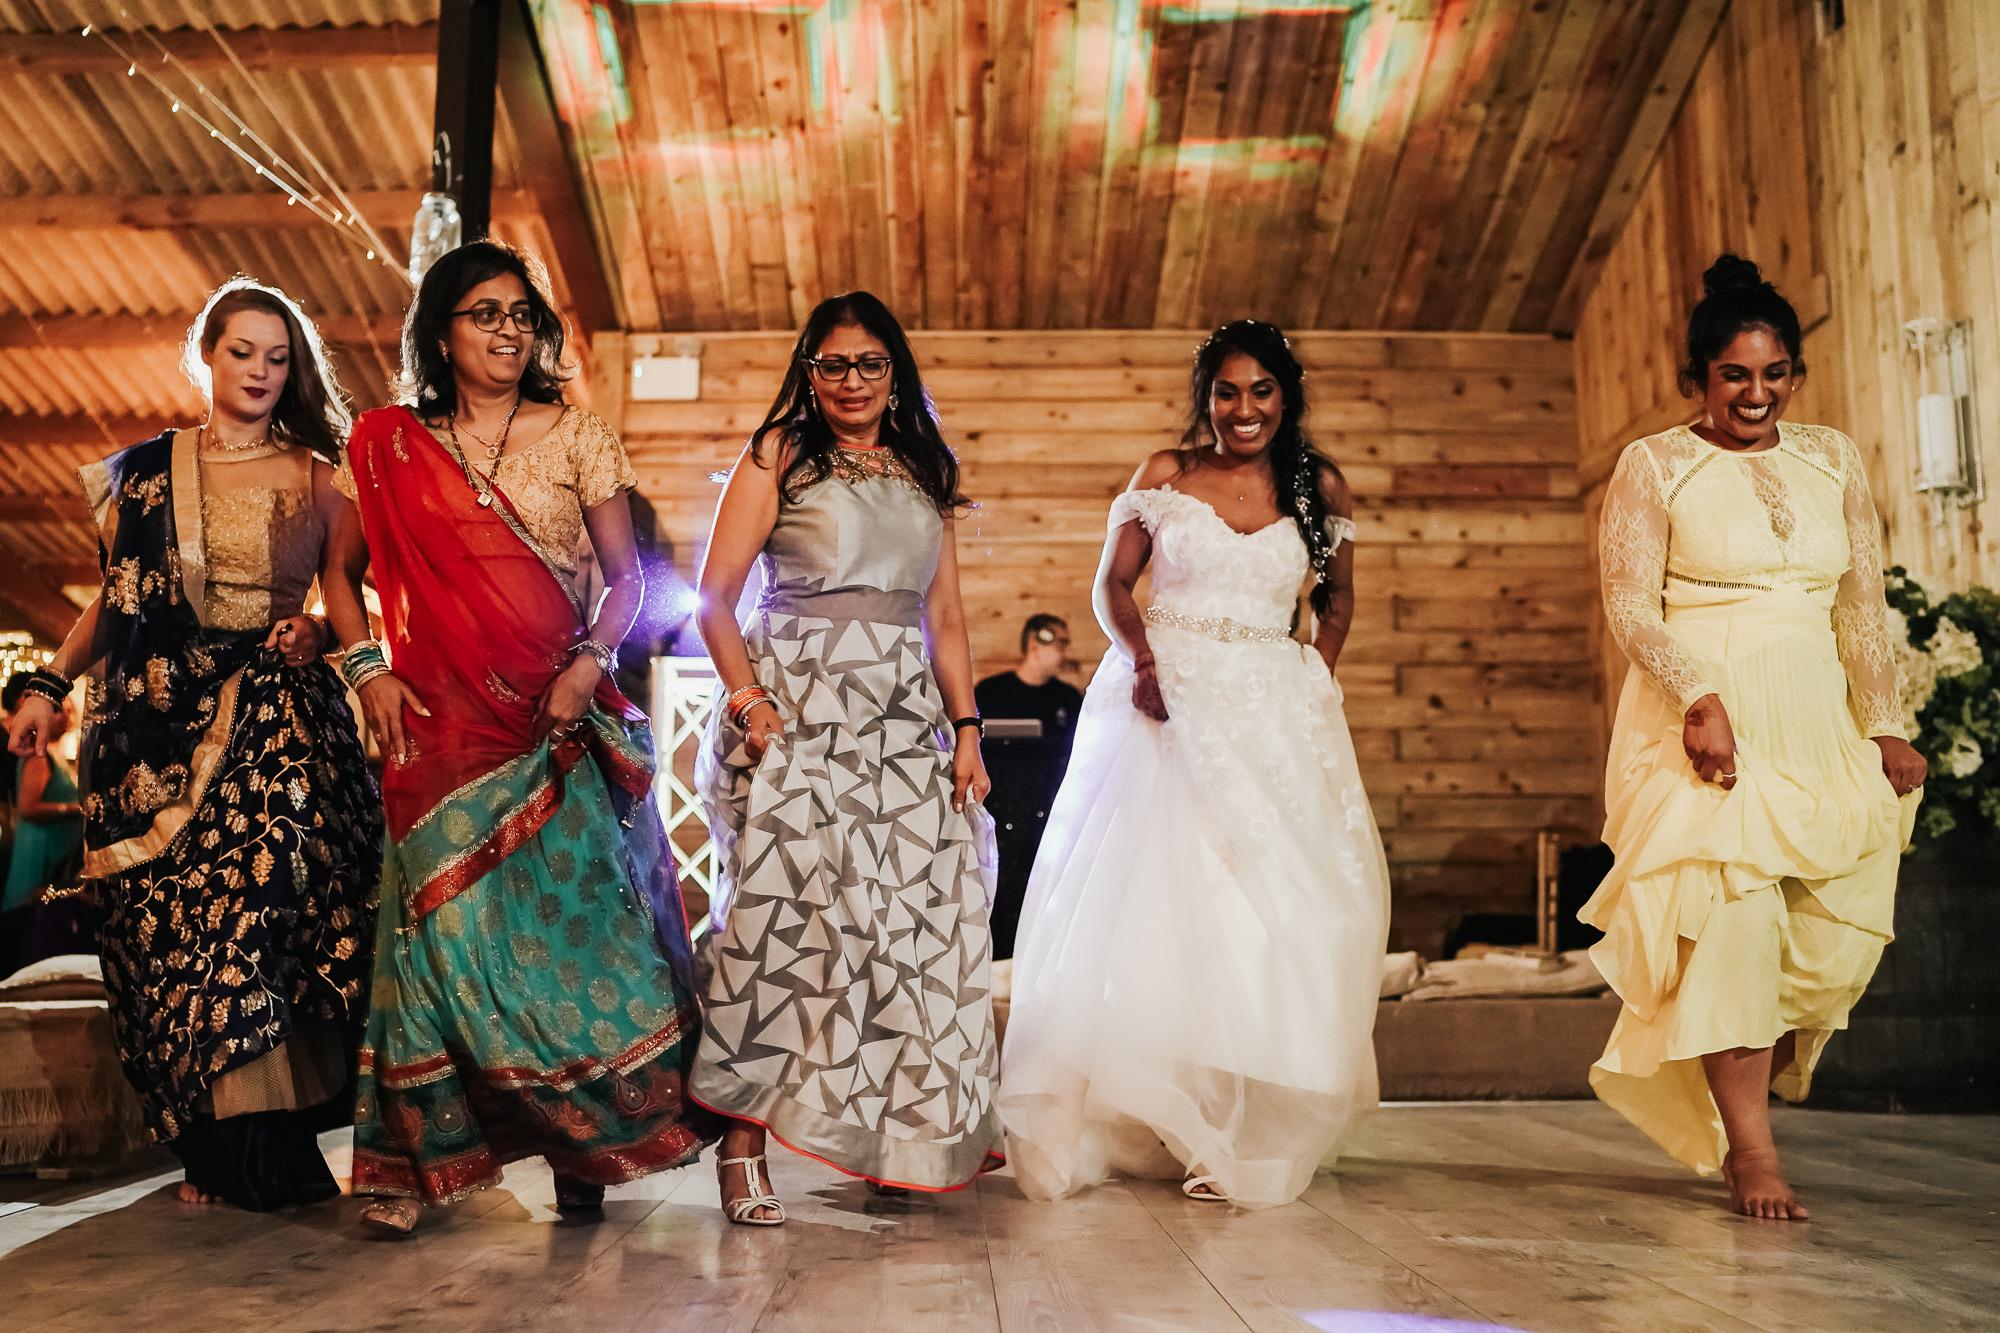 Alcumlow Hall Farm Indian Wedding Photographer (44 of 44).jpg